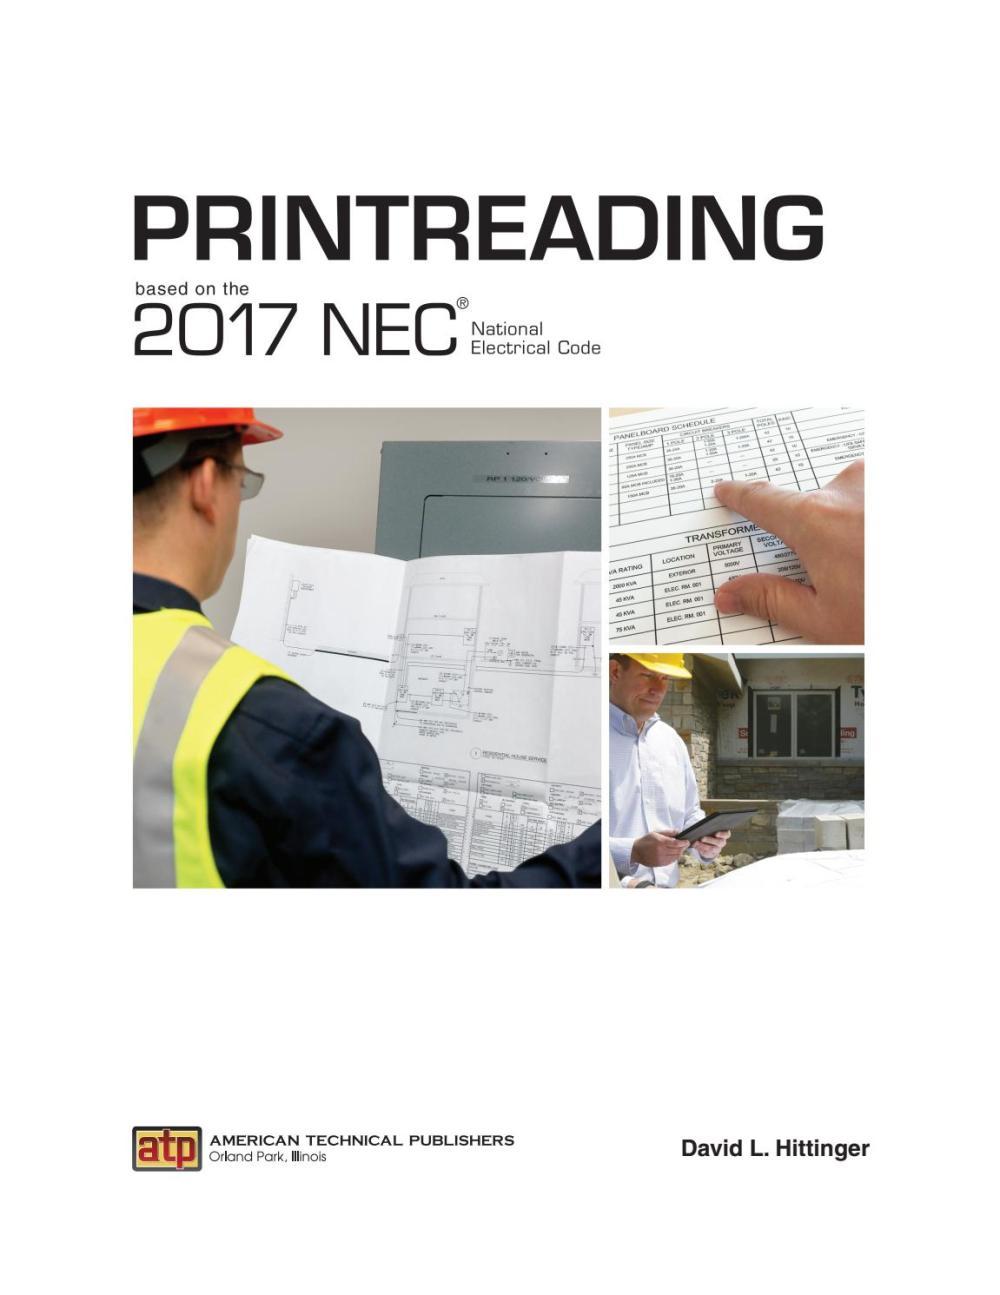 medium resolution of printreading based on the 2017 nec